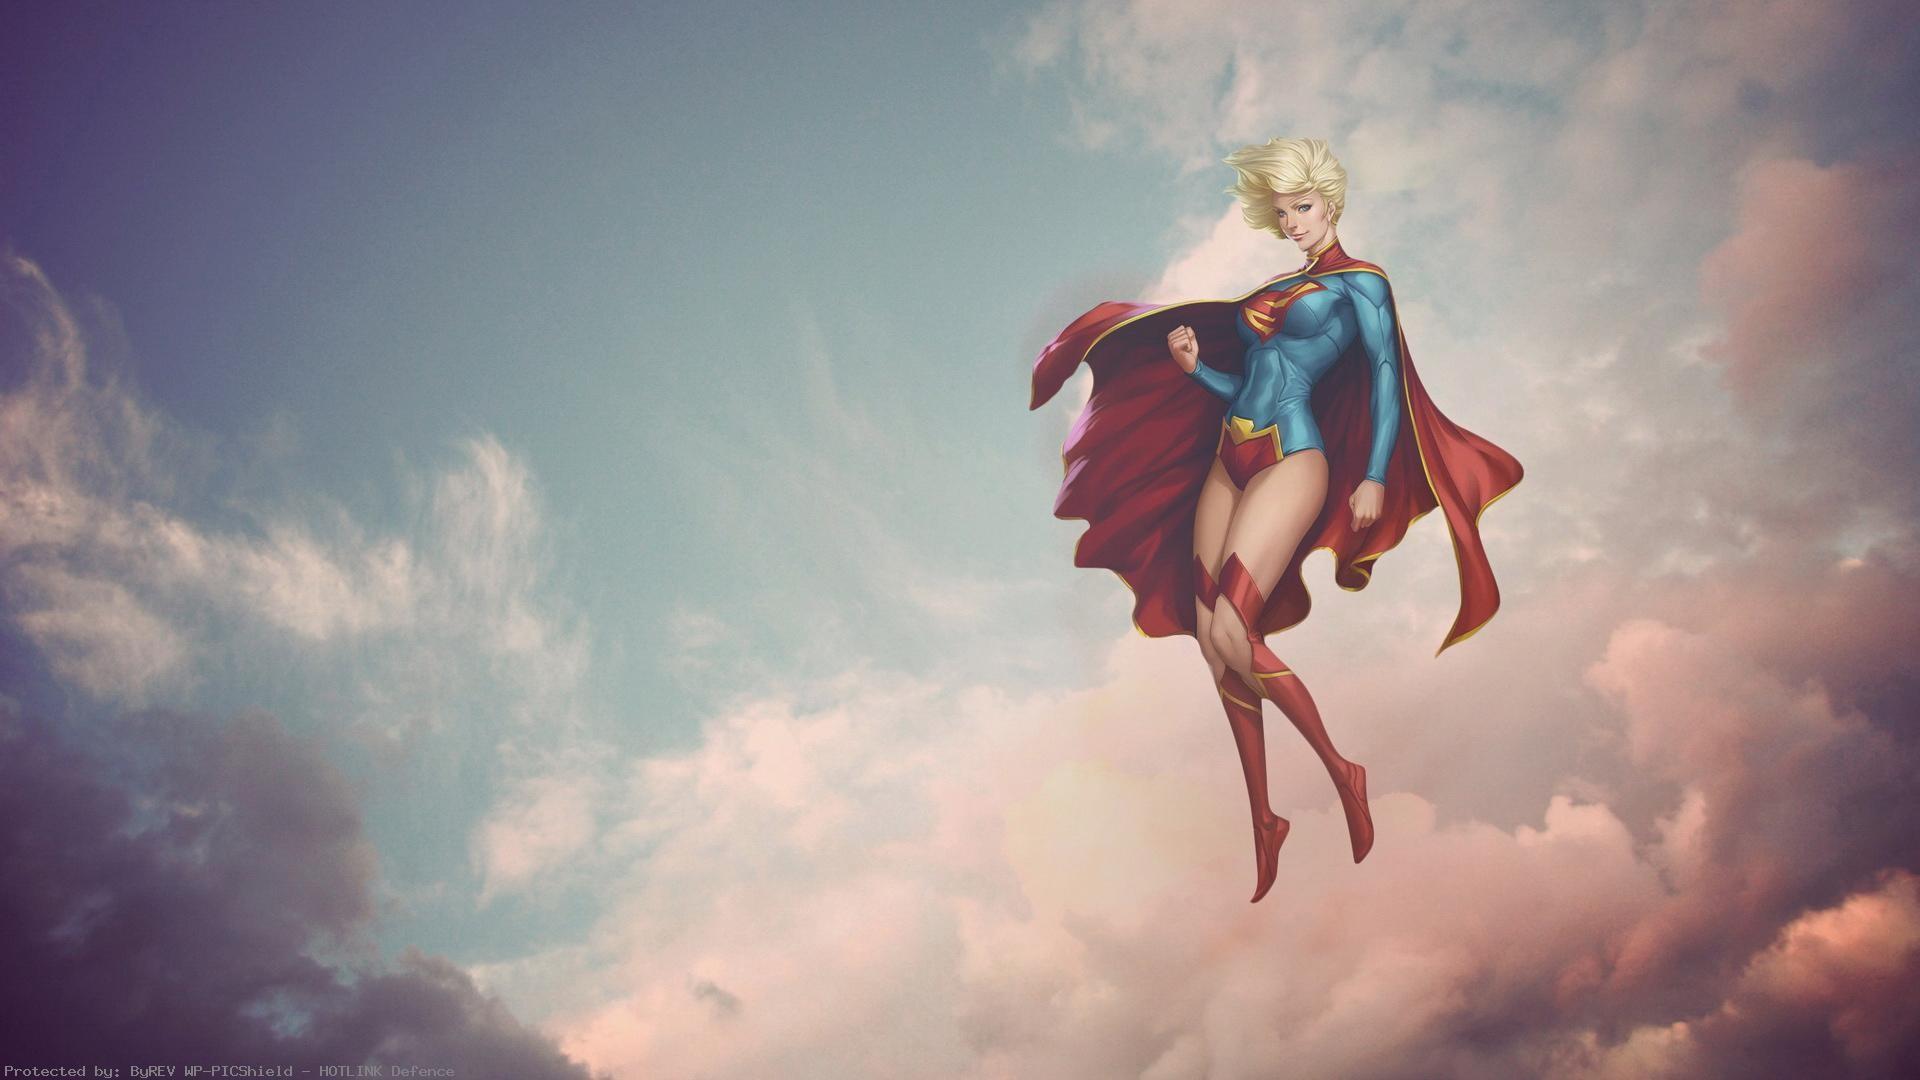 Supergirl-1920×1080-wallpaper-wp80012565